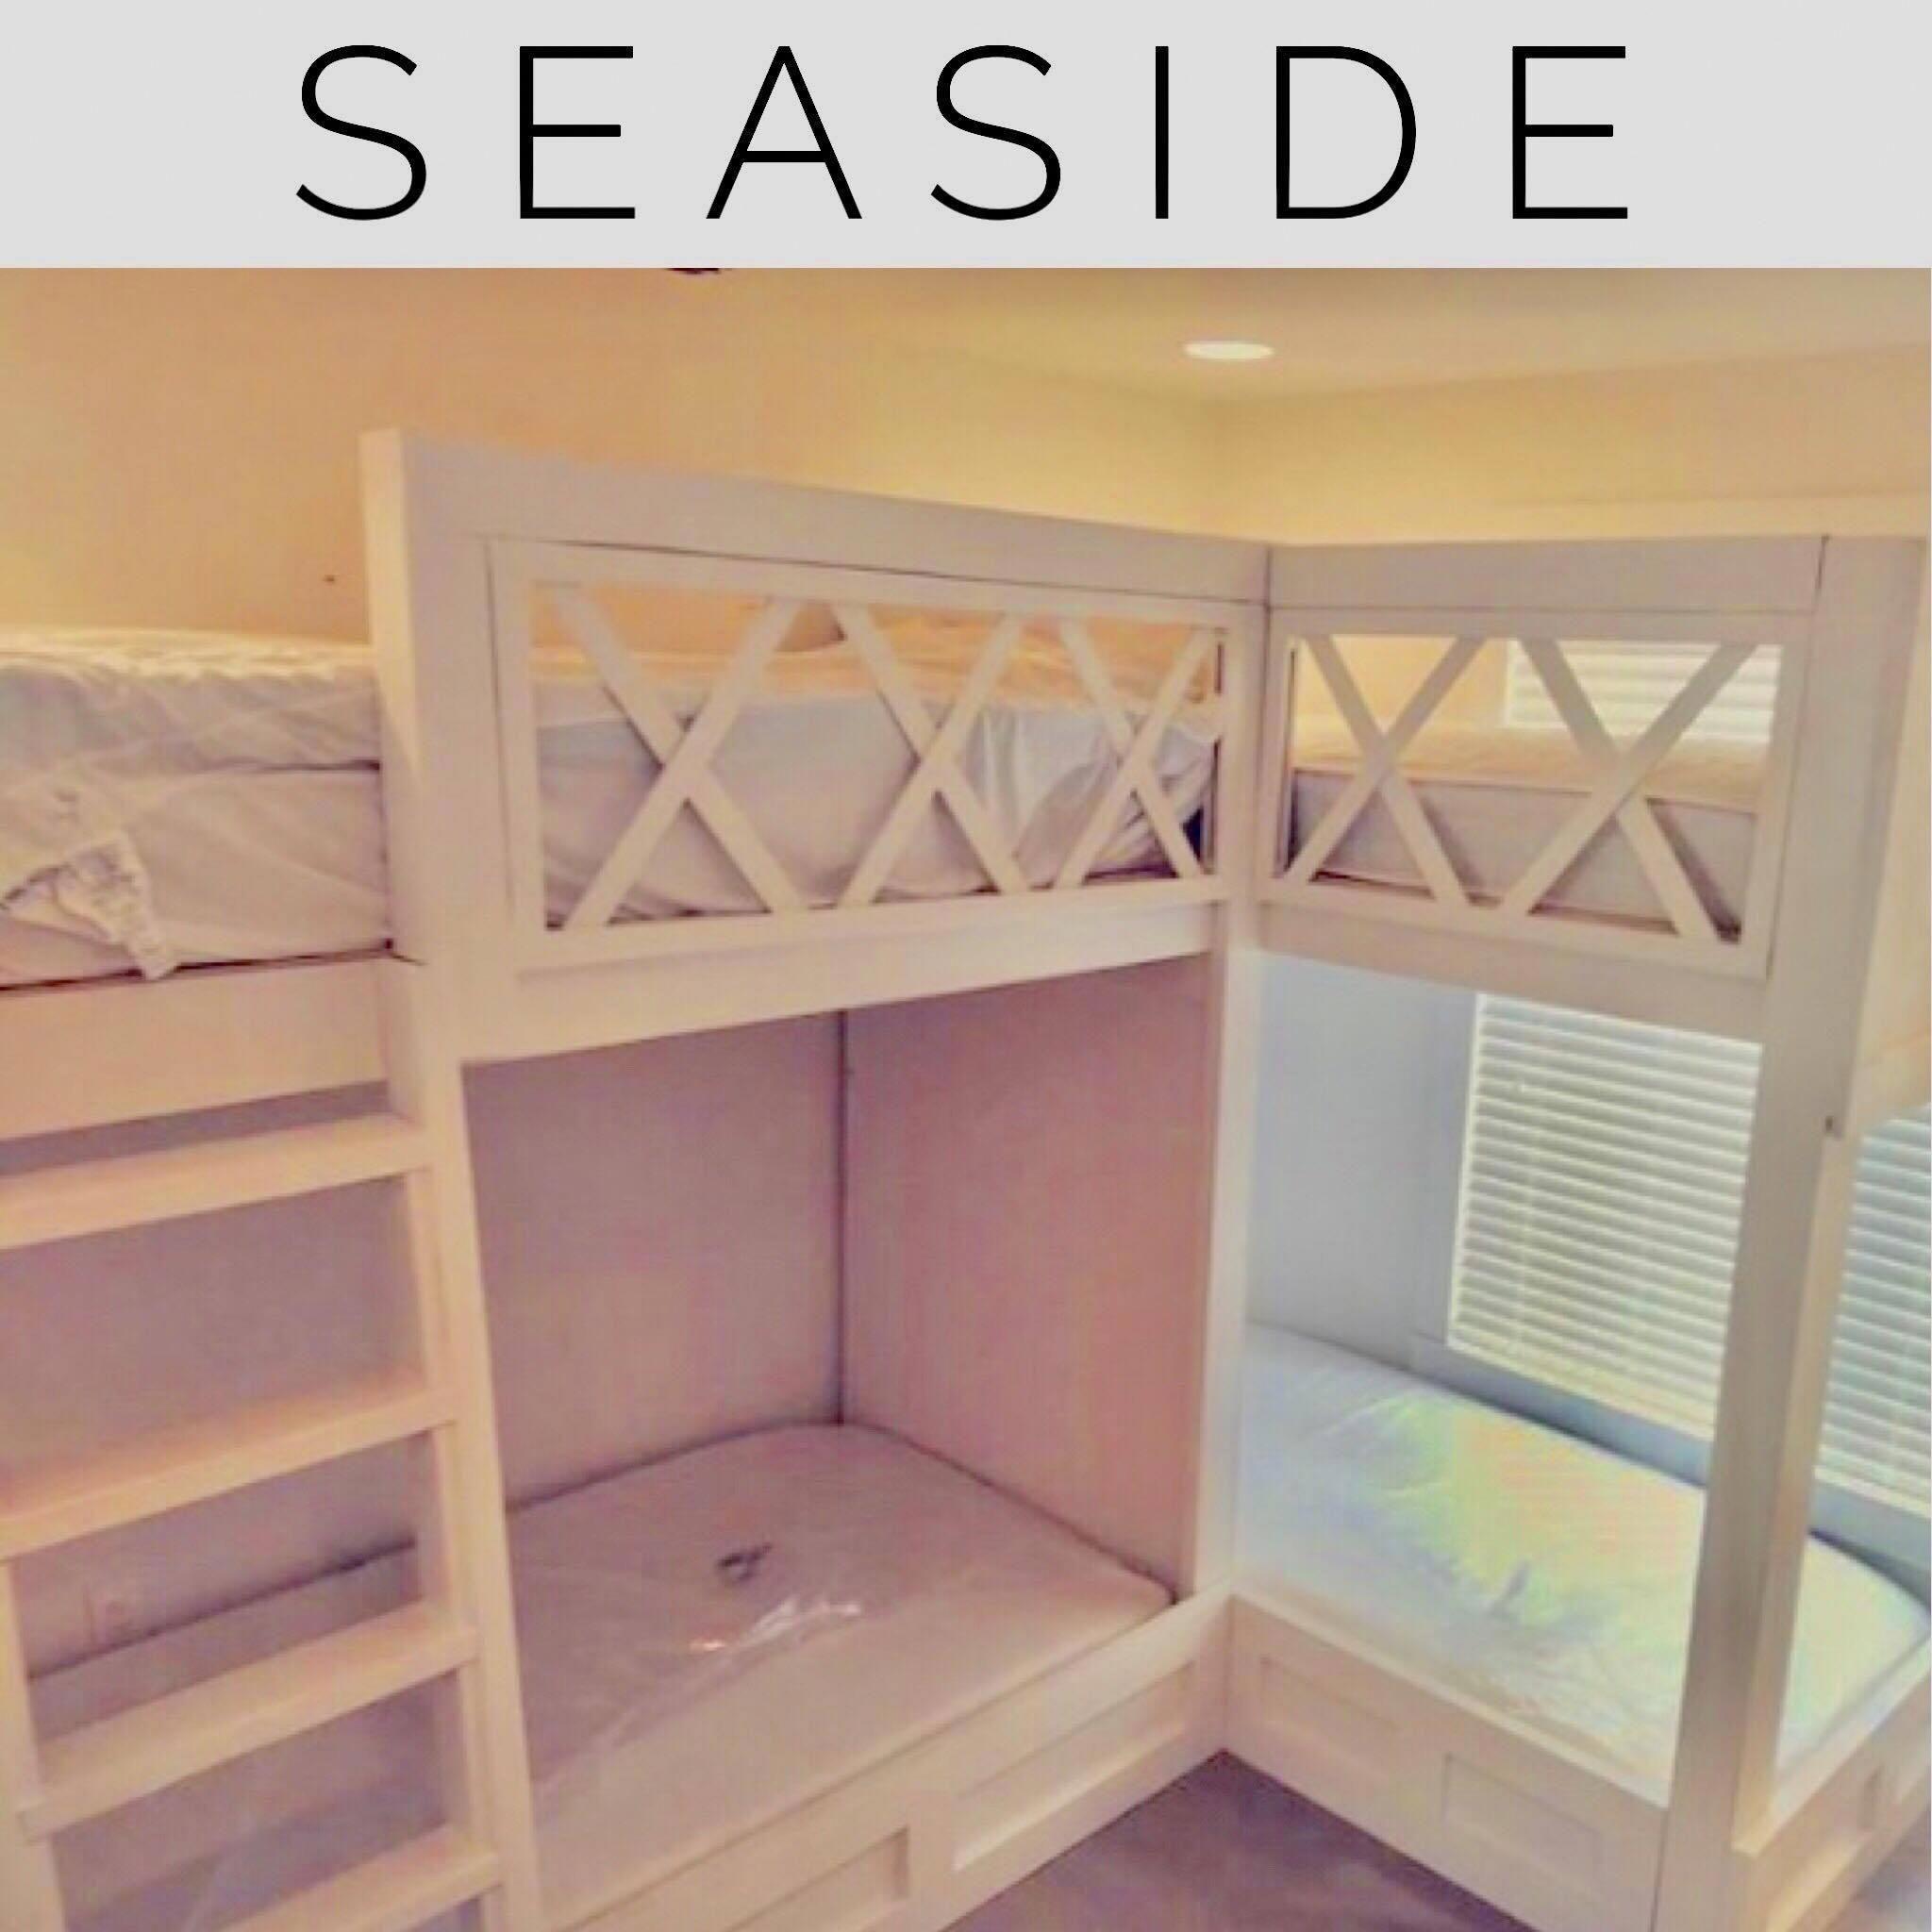 Bunk Beds Full Over Full Bunk Bed Reading Light For Kids Furnitureonline Furniturekayu Bunkbeds Kids Bunk Beds Bunk Beds Kid Beds